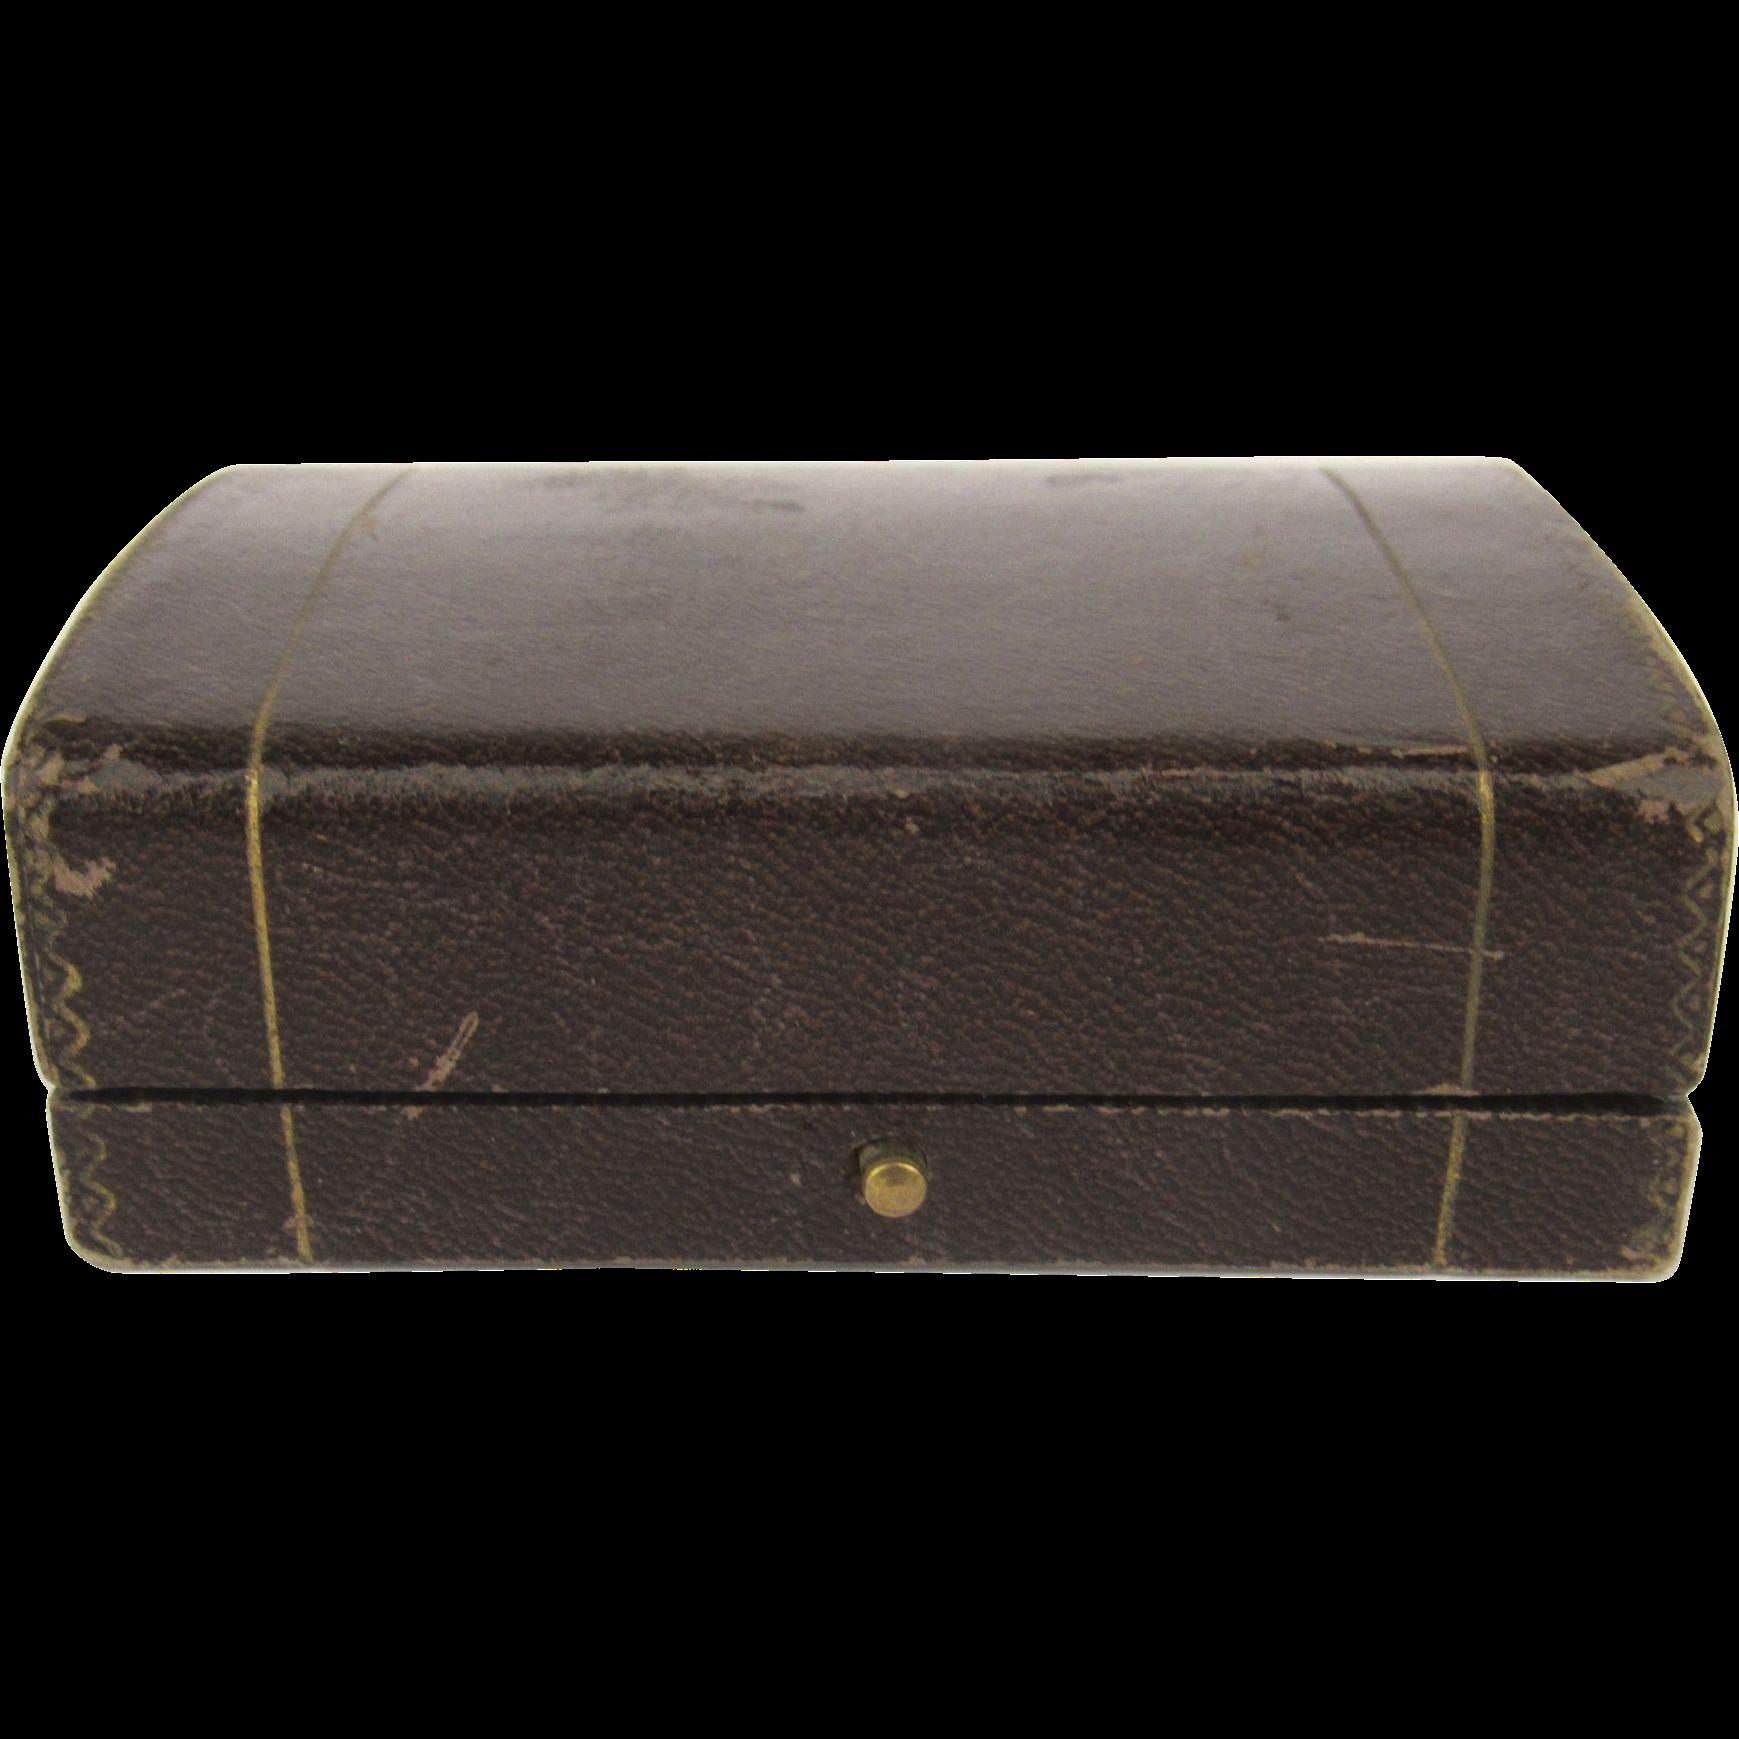 Vintage Florentine Mini Jewelry Ring Box Tooled Leather Gilt